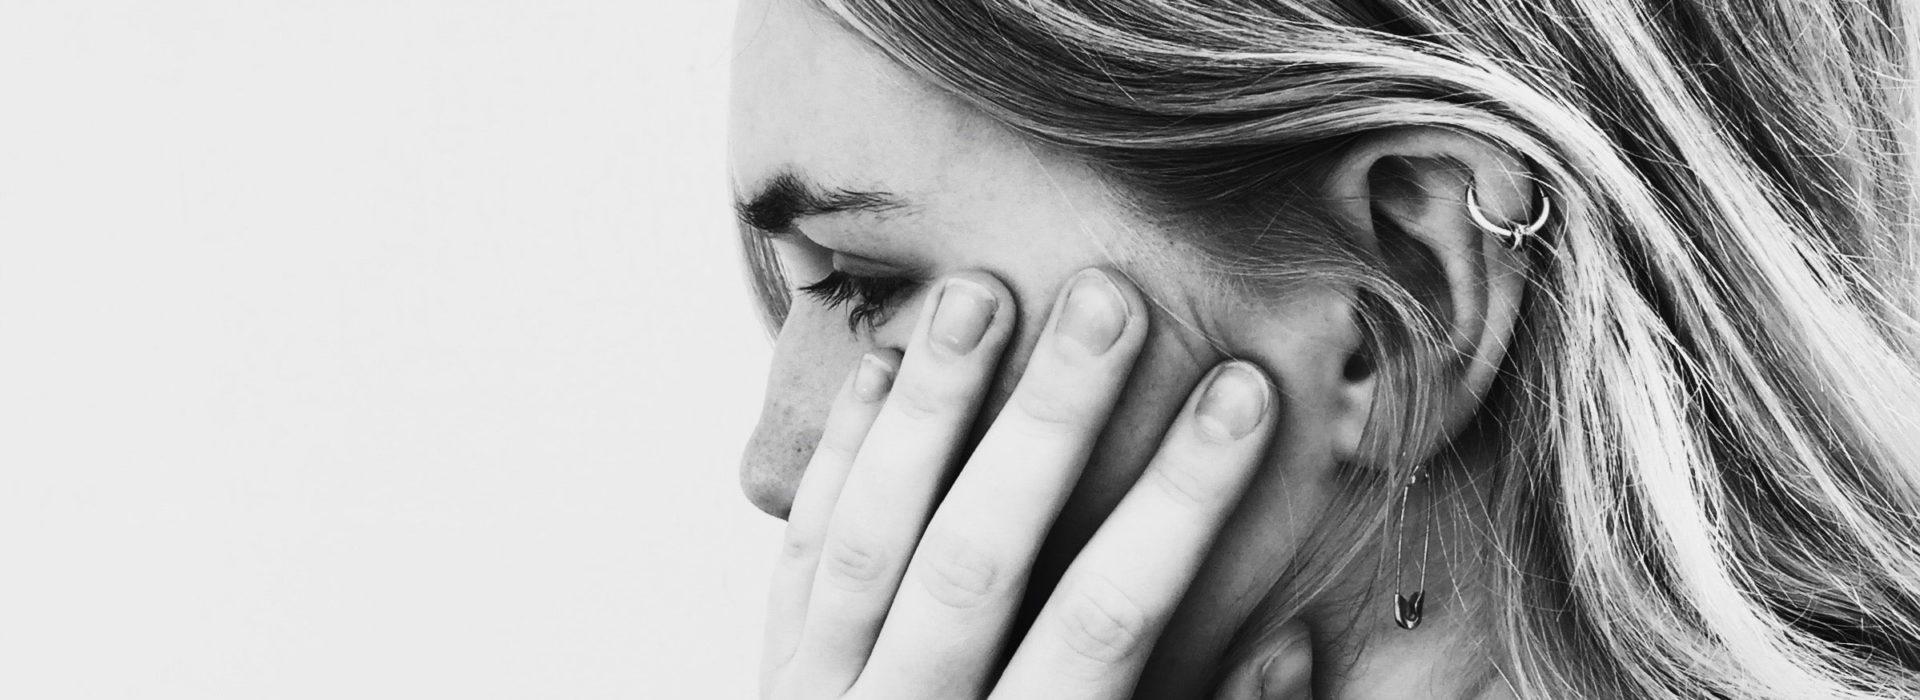 Voldsramte kvinder - social kontrol